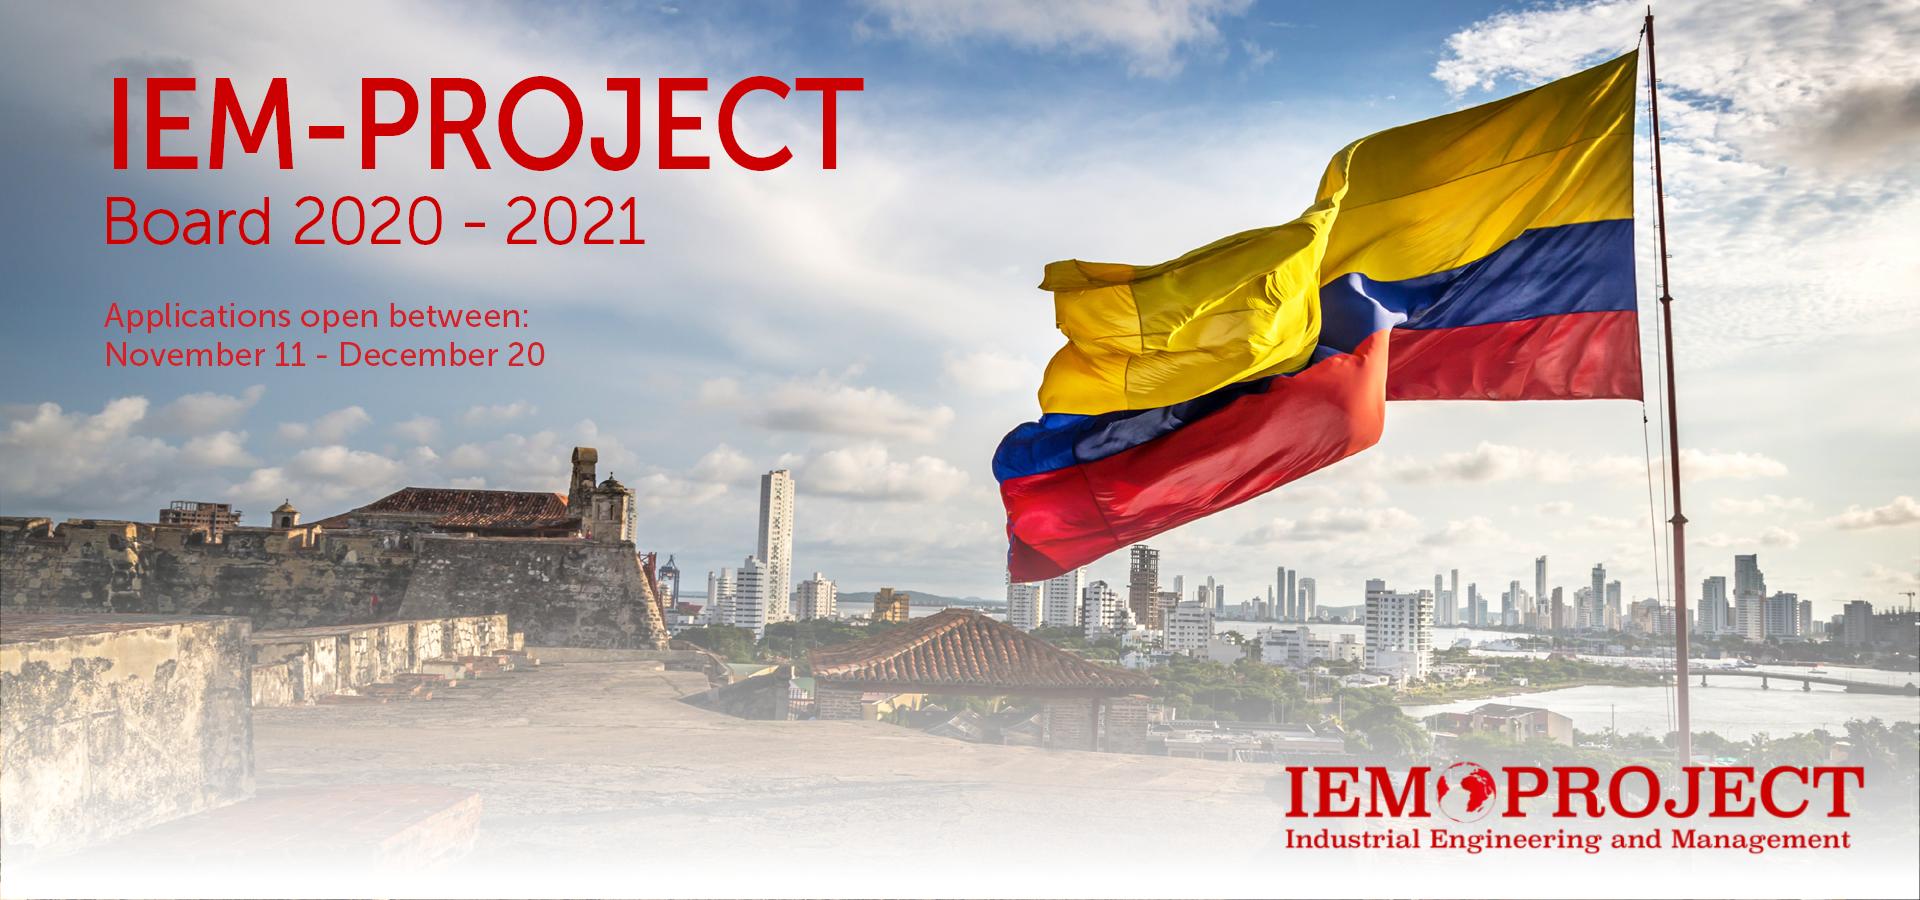 IEM-Project Board Applications